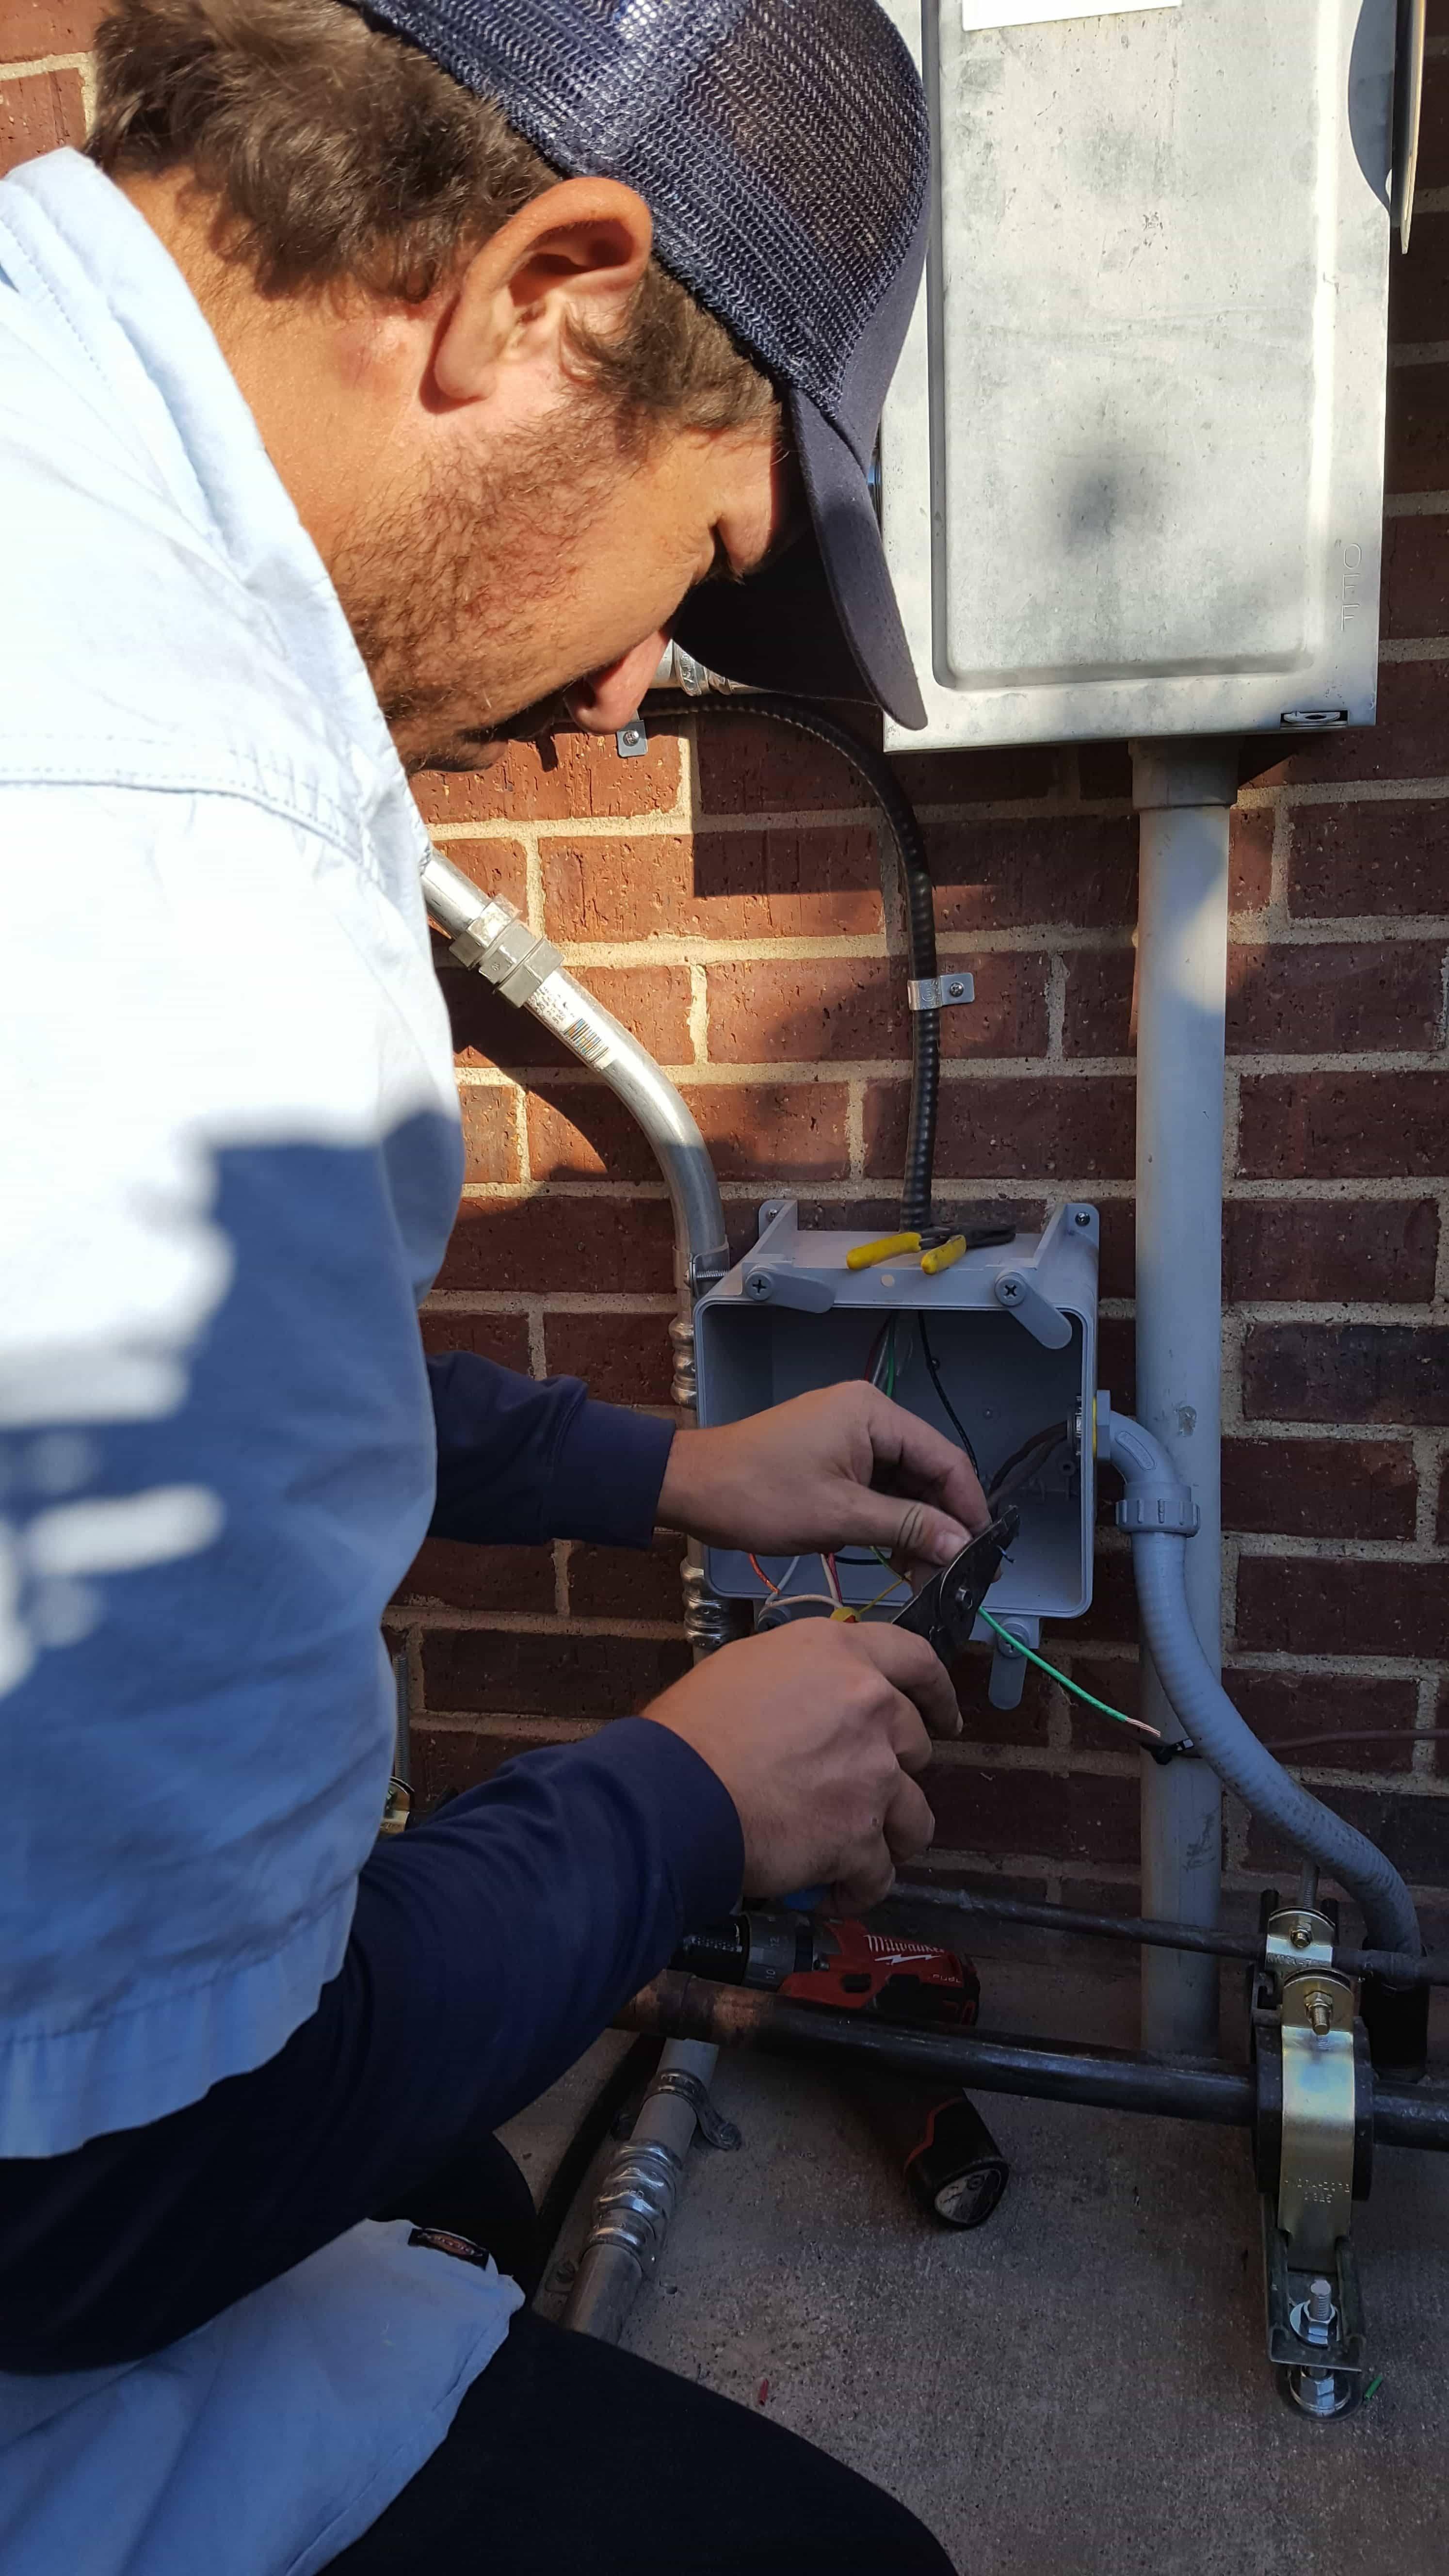 HVAC Services We Provide